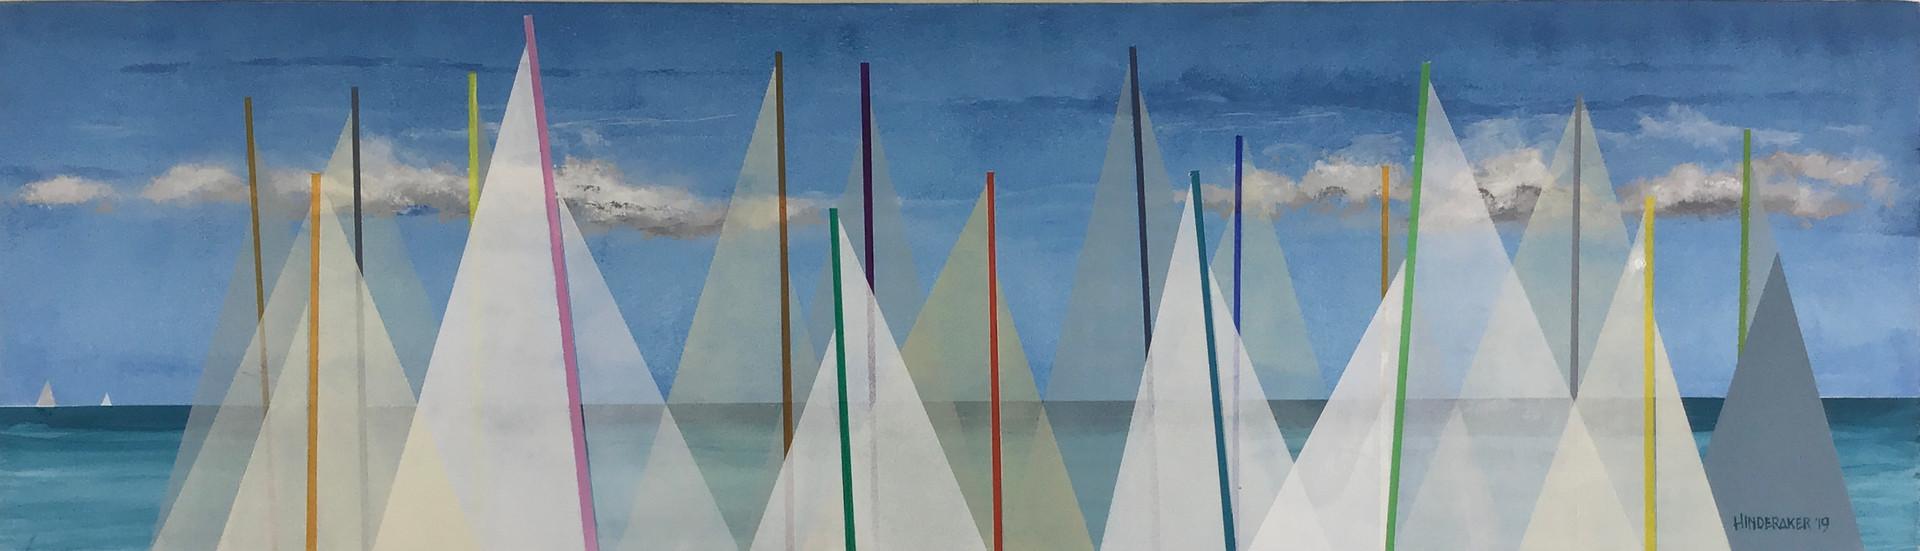 Sails #199